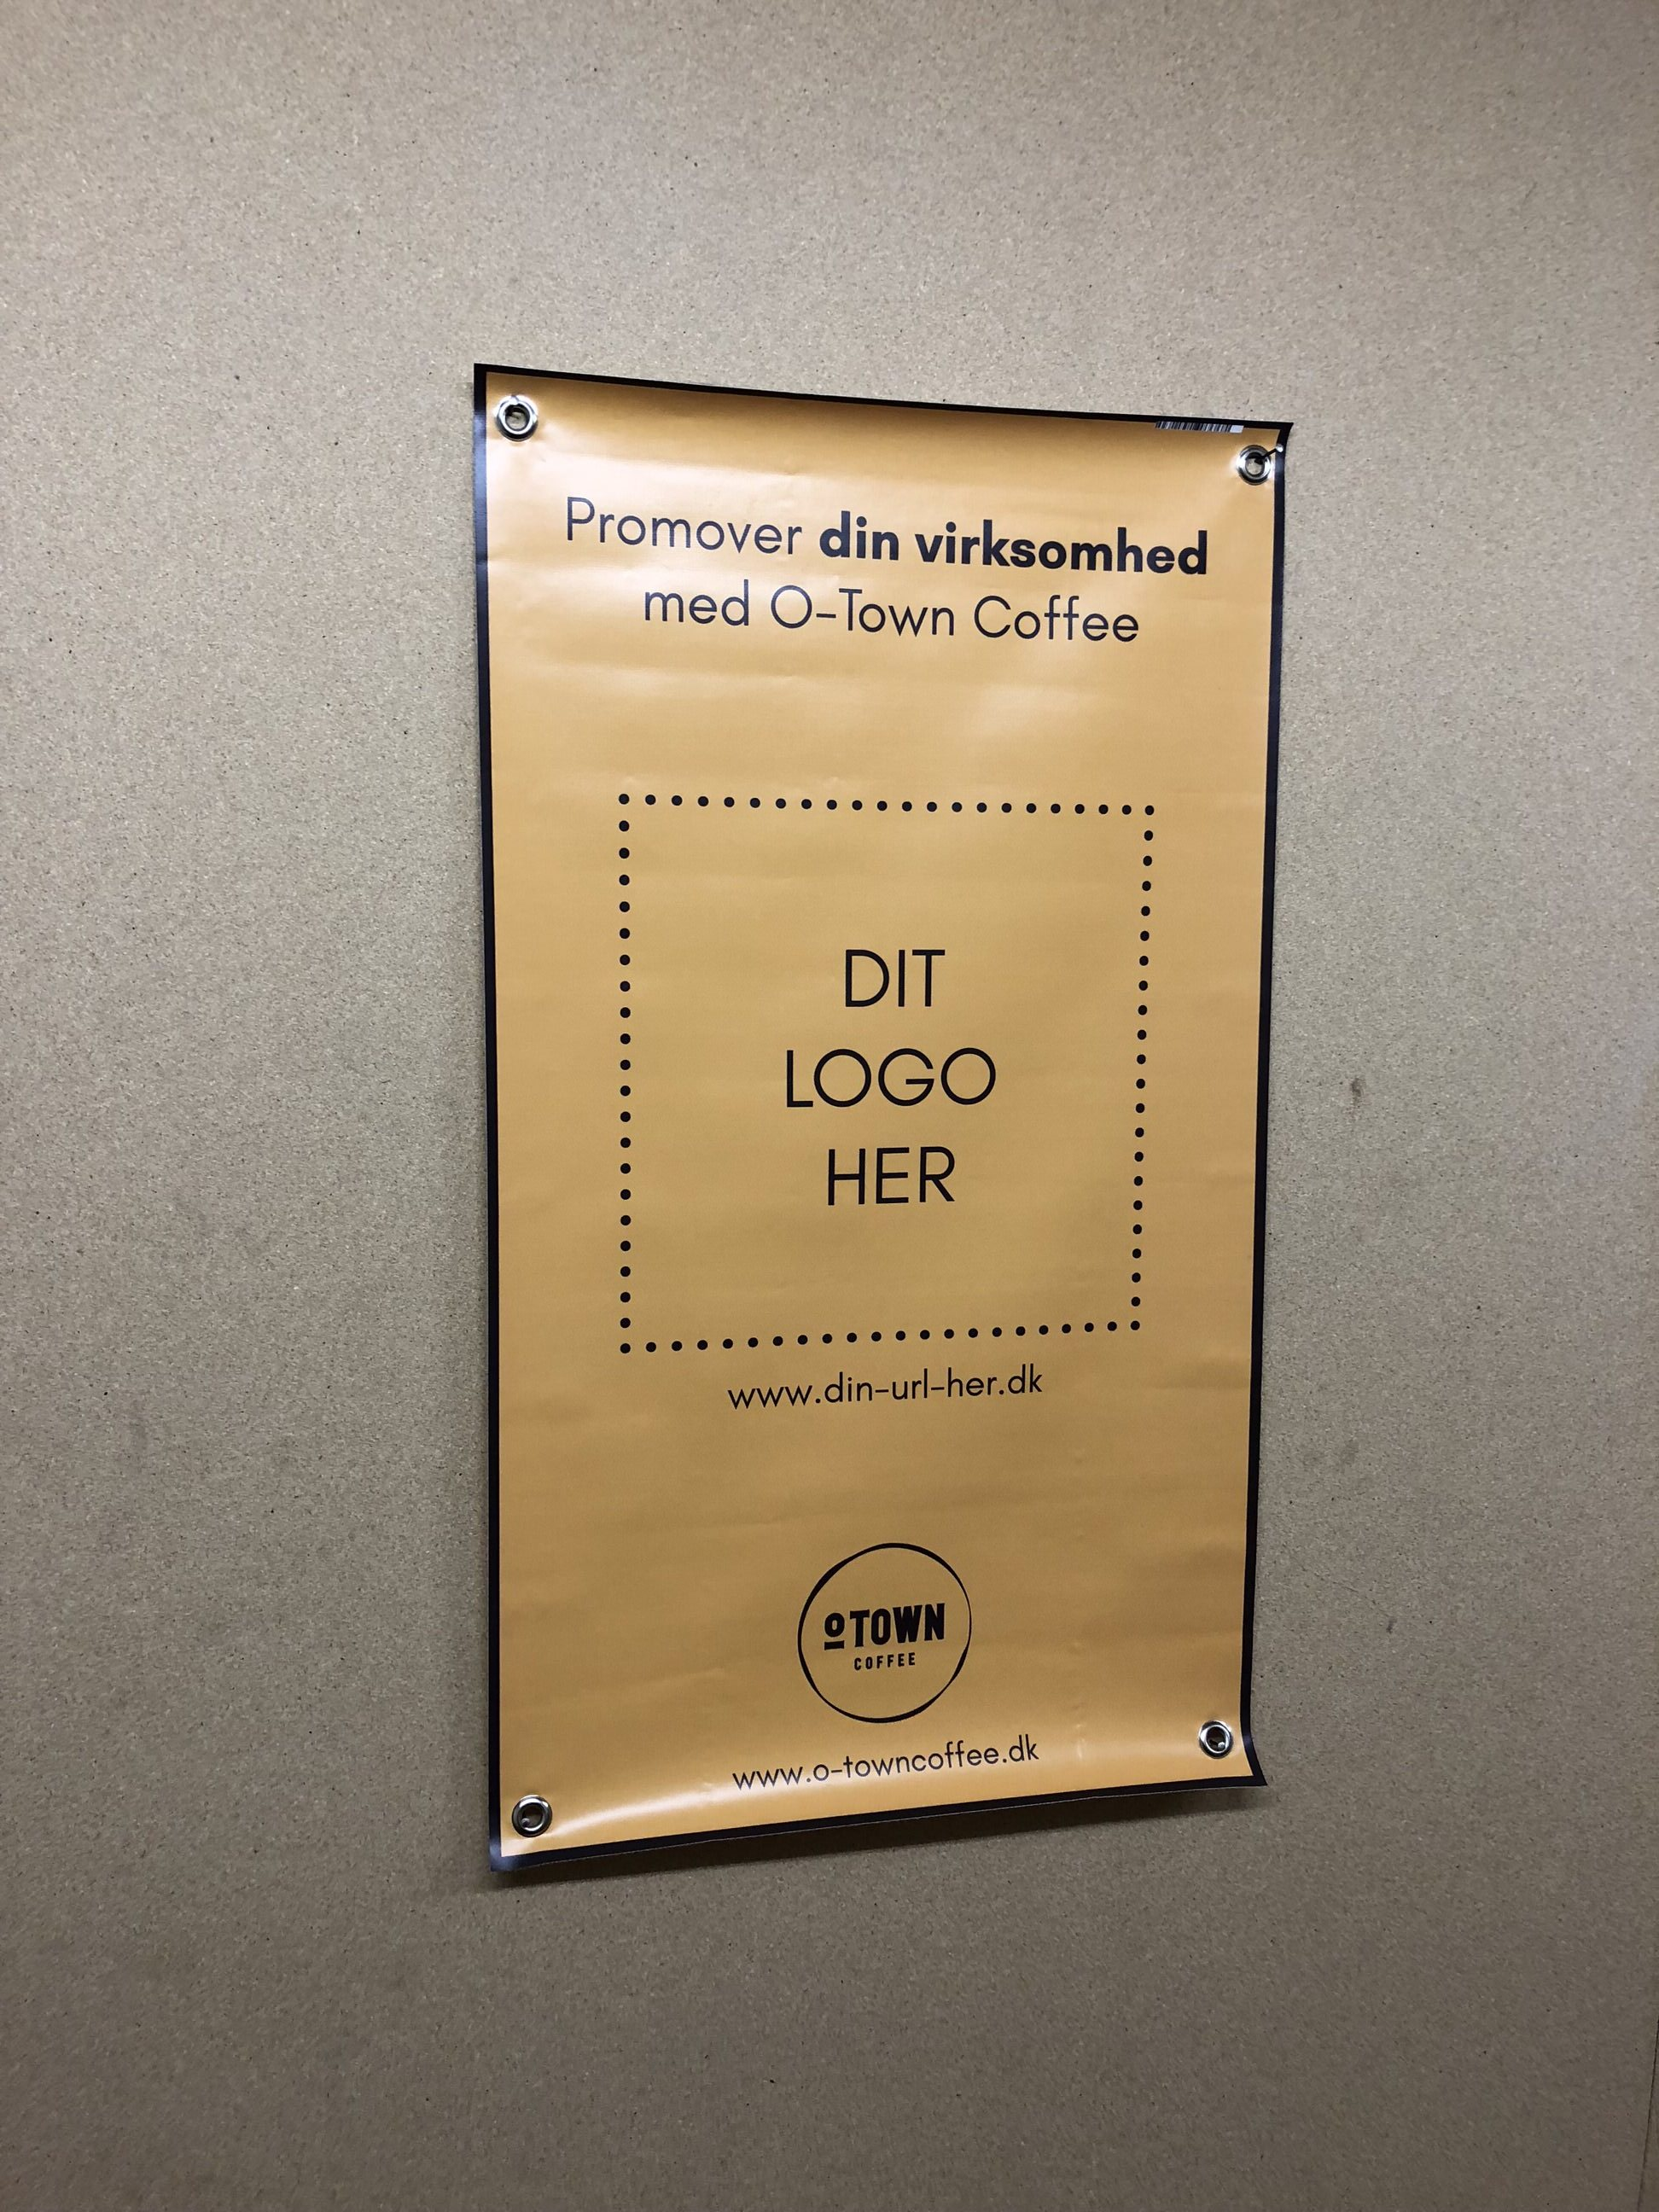 O-Town Coffee Virksomhedsbranding 6